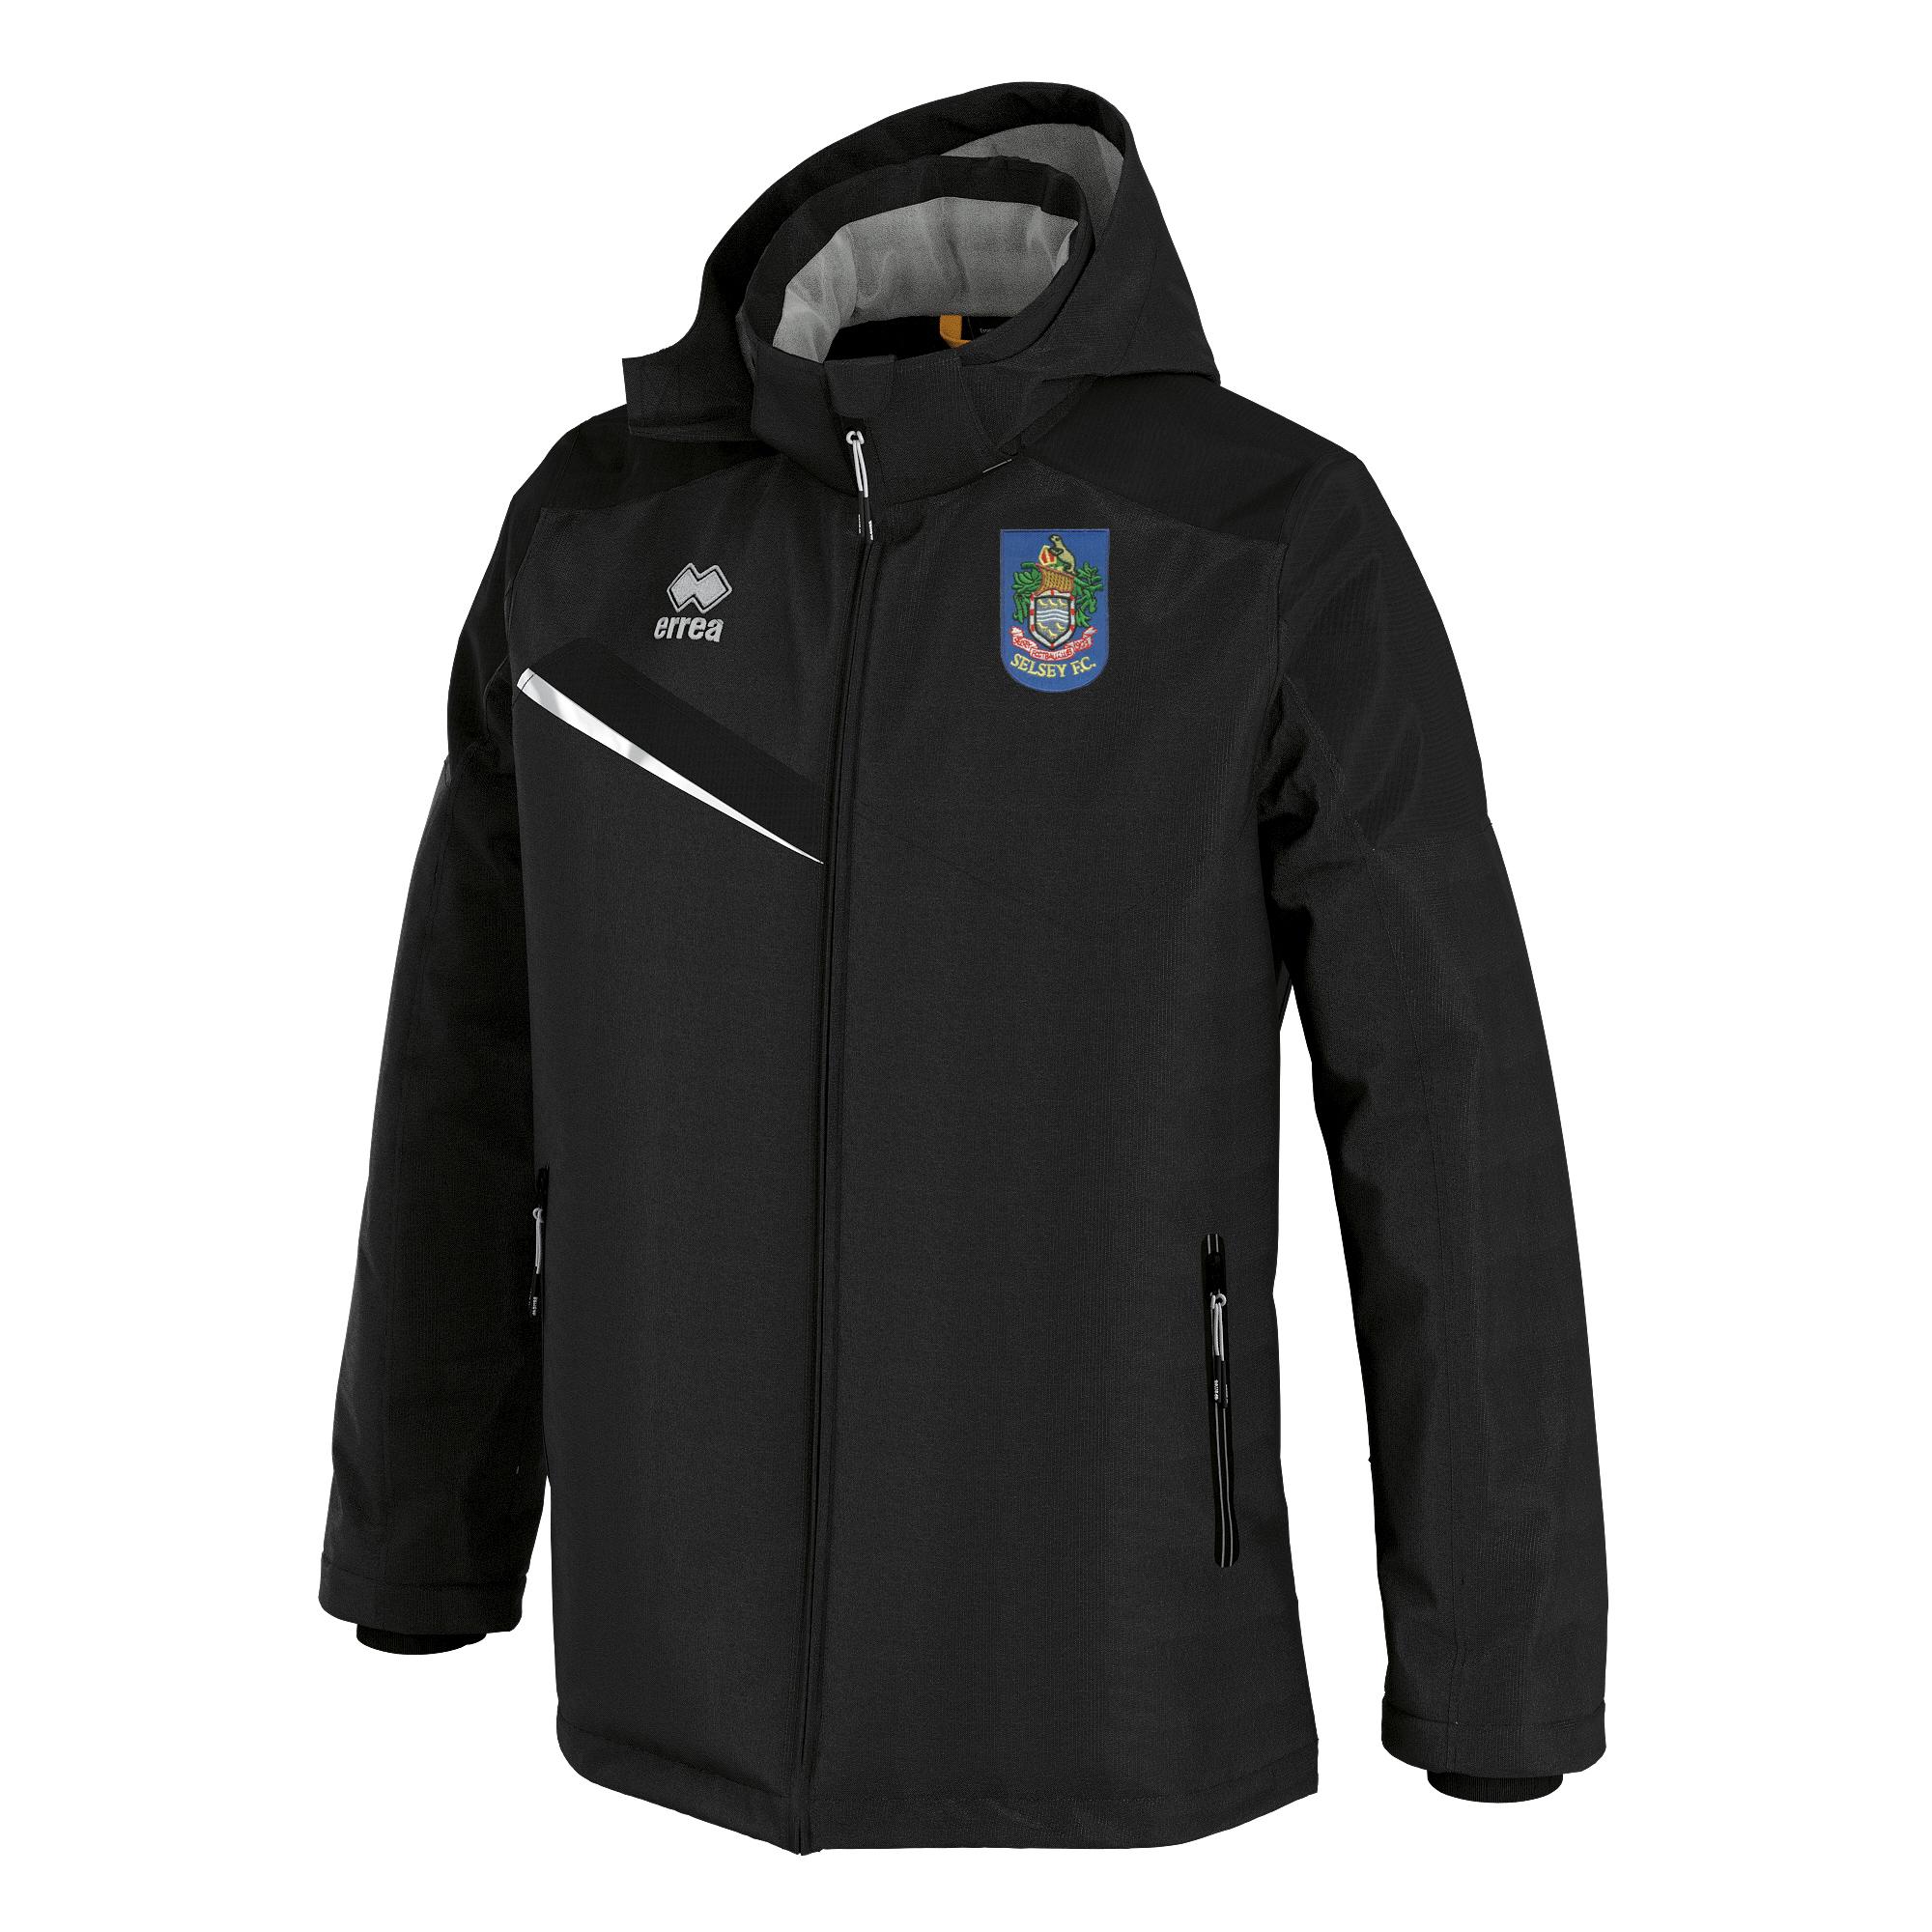 Selsey FC Errea Iceland 3 Winter Jacket Black